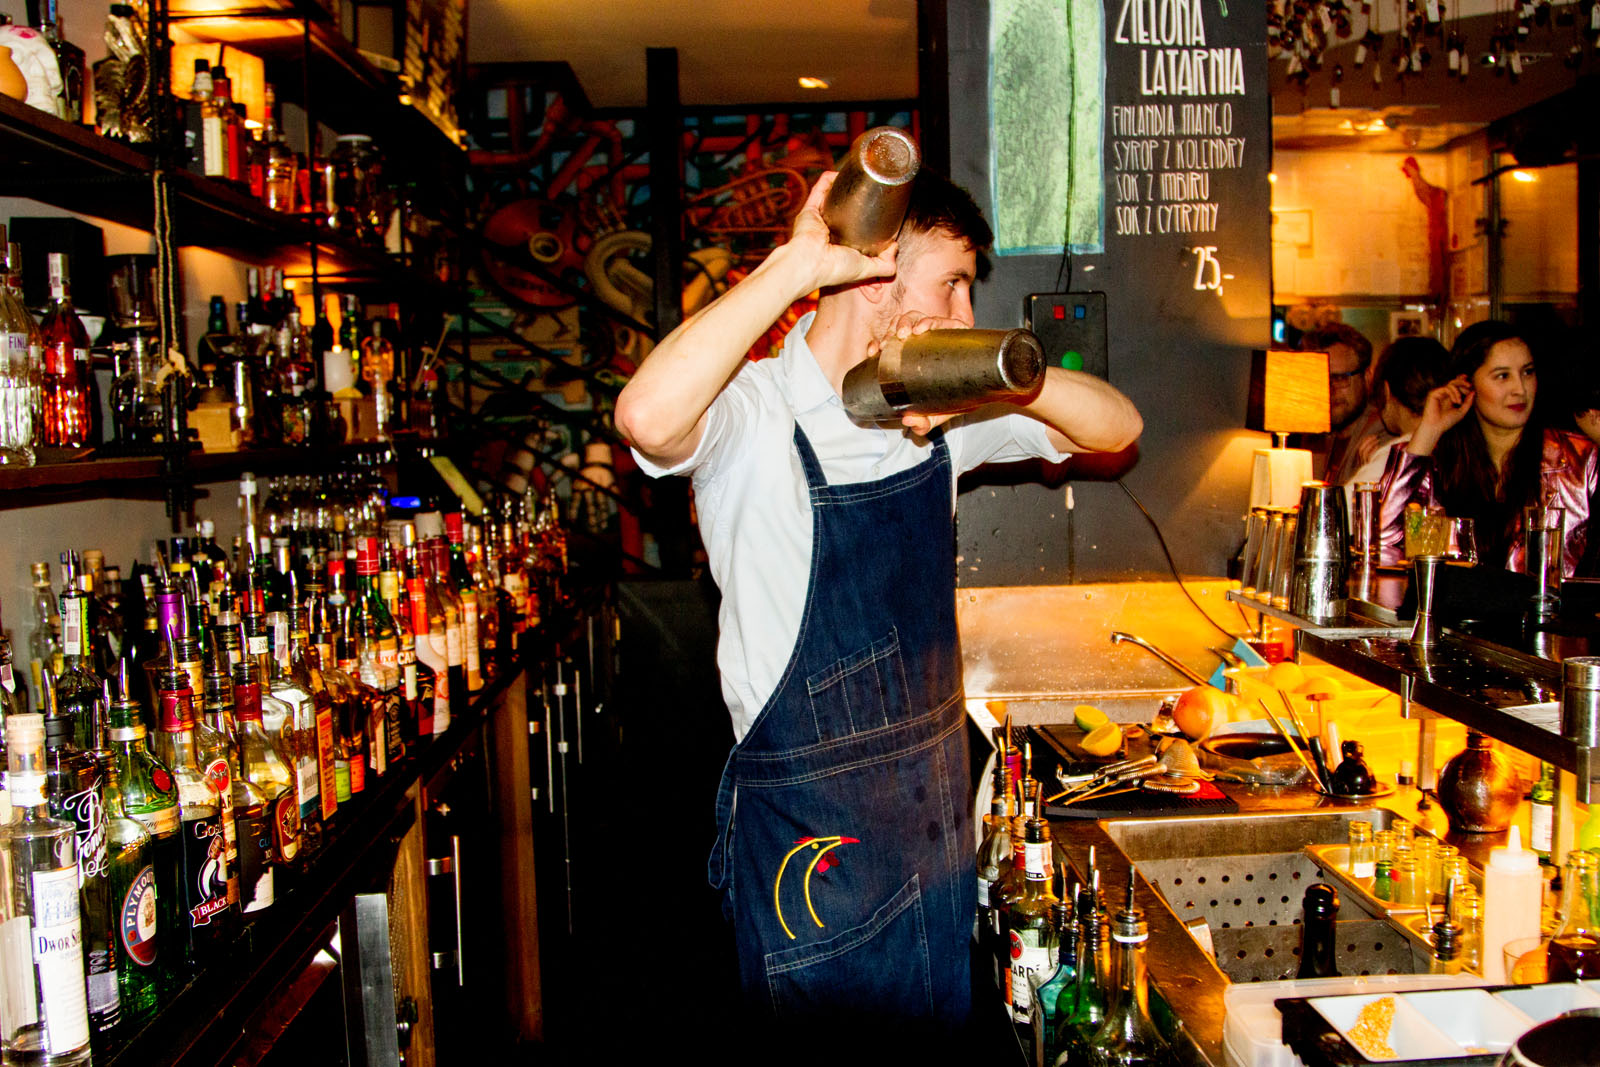 Barman: The Kita Koguta cocktail bar